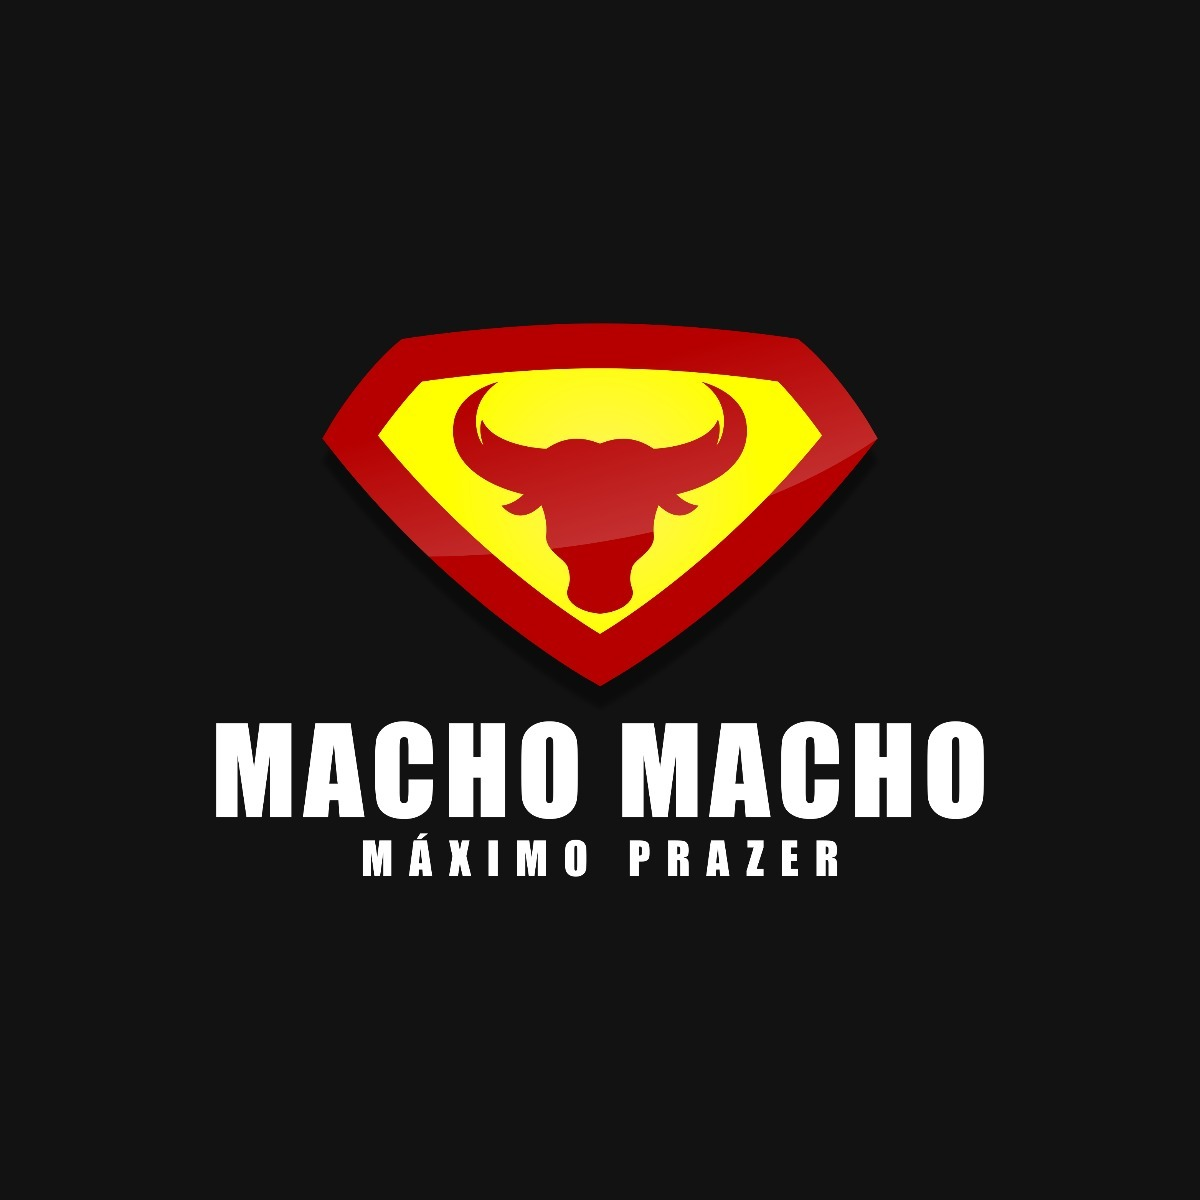 macho macho